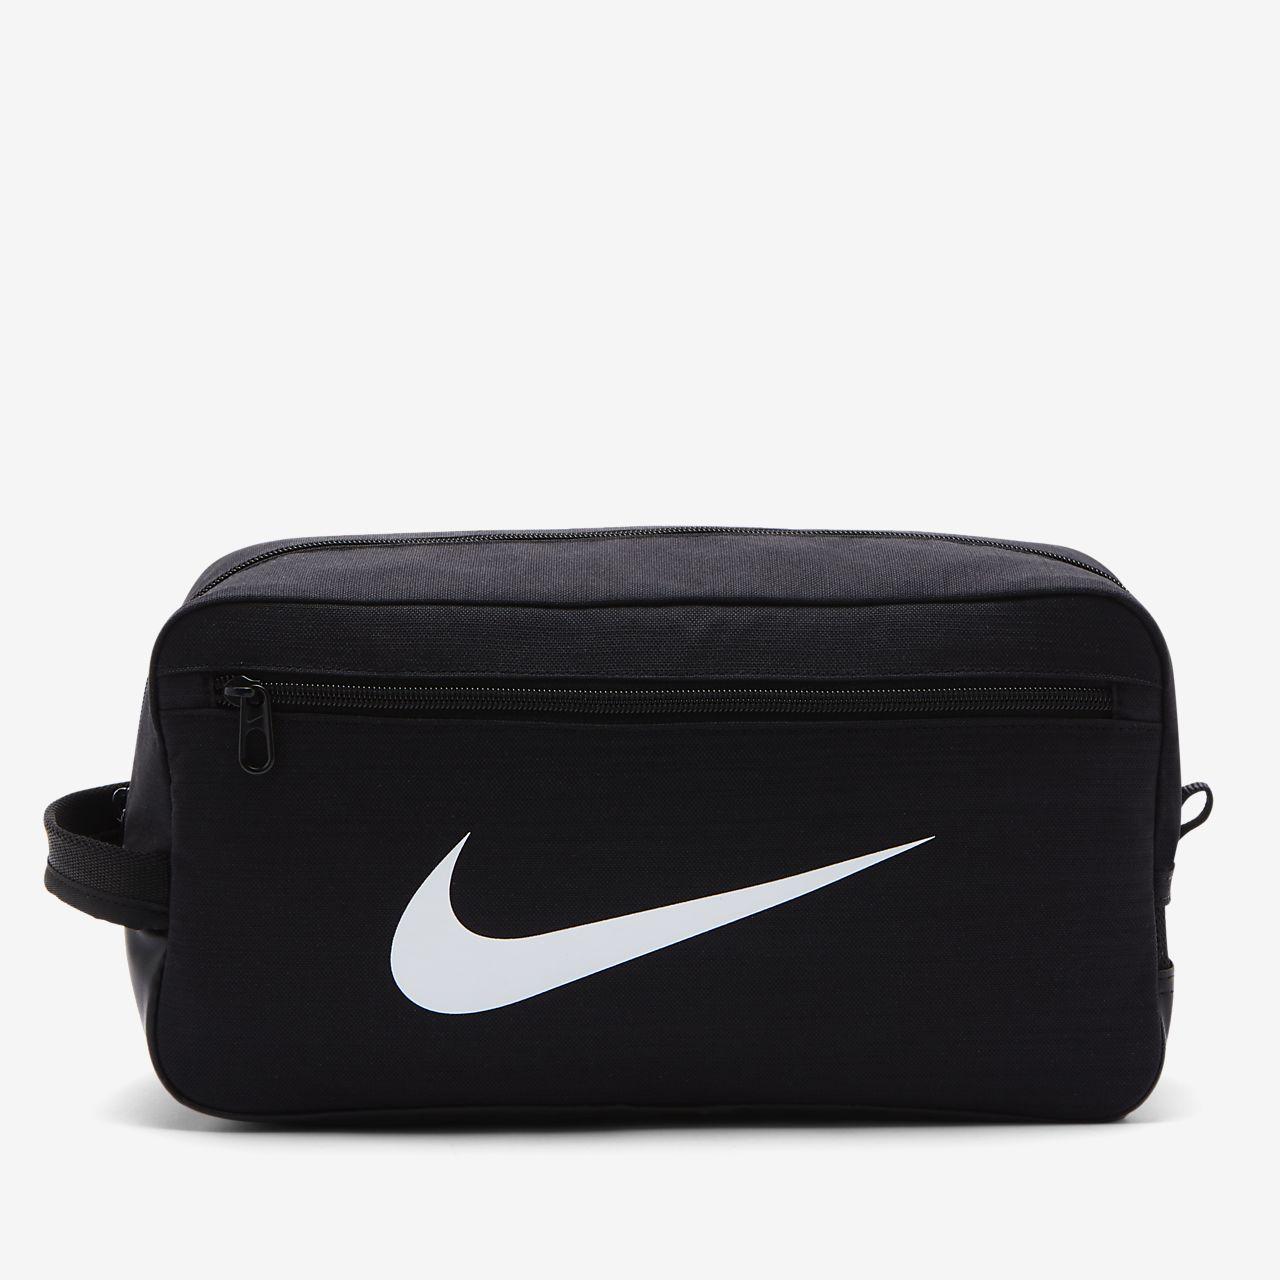 Nike Brasilia Training Shoe Bag